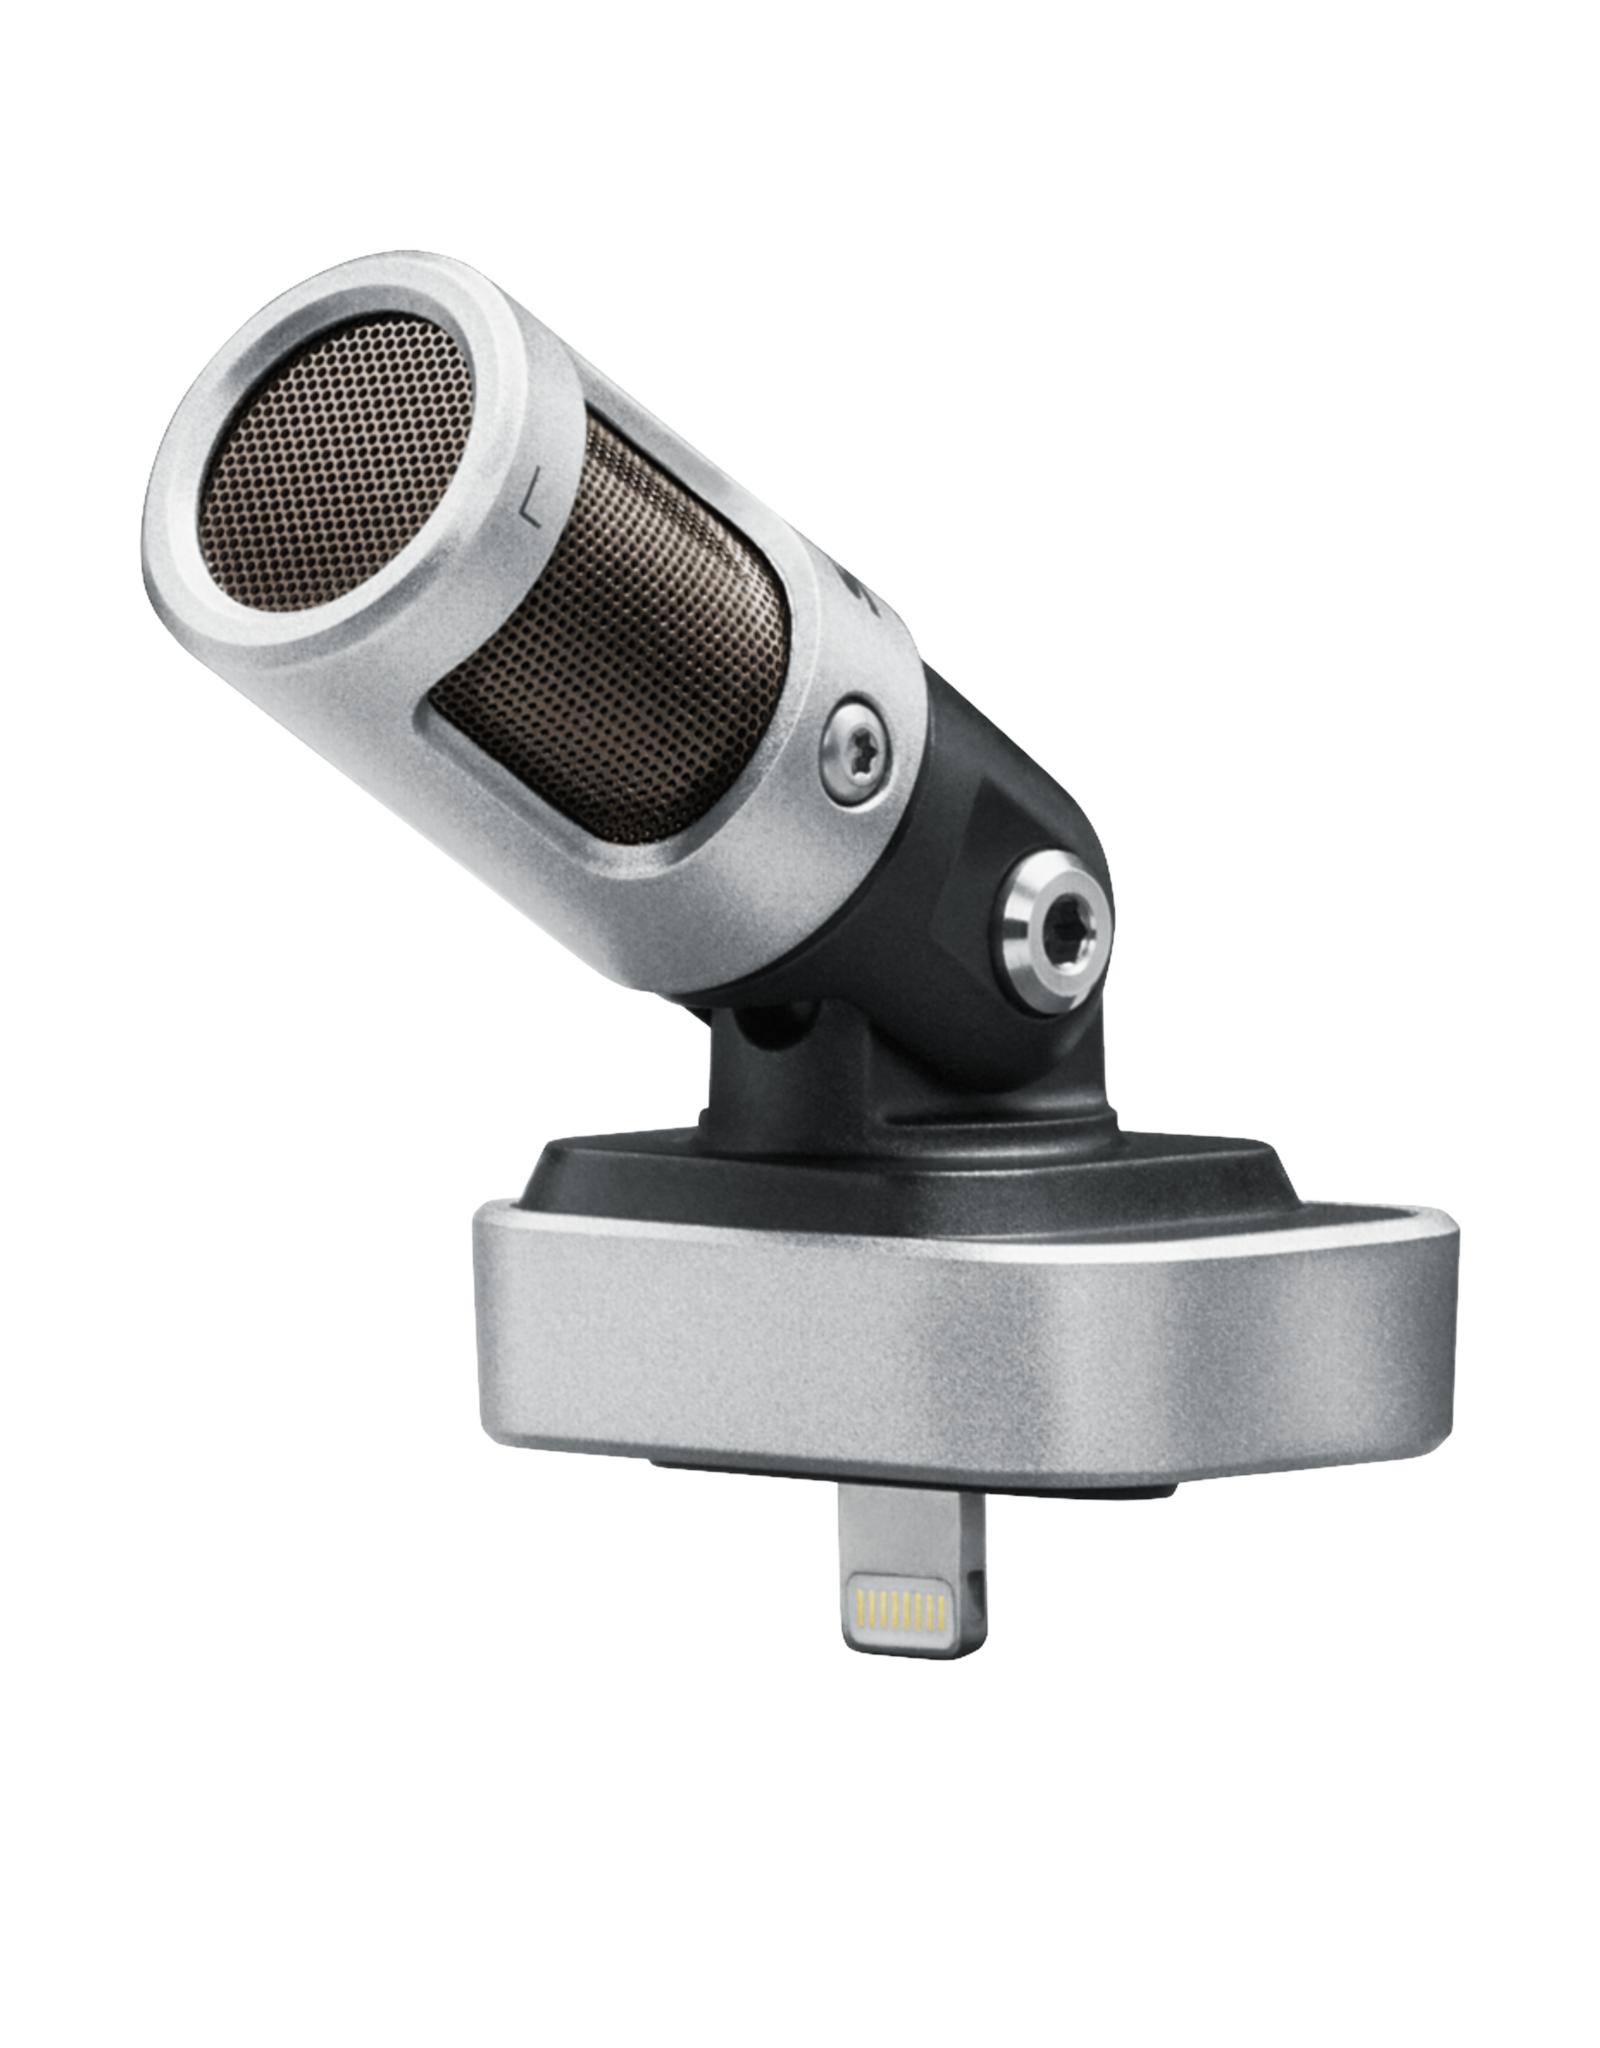 Shure Shure MOTIV MV88 iOS Digital Stereo Condenser Mic